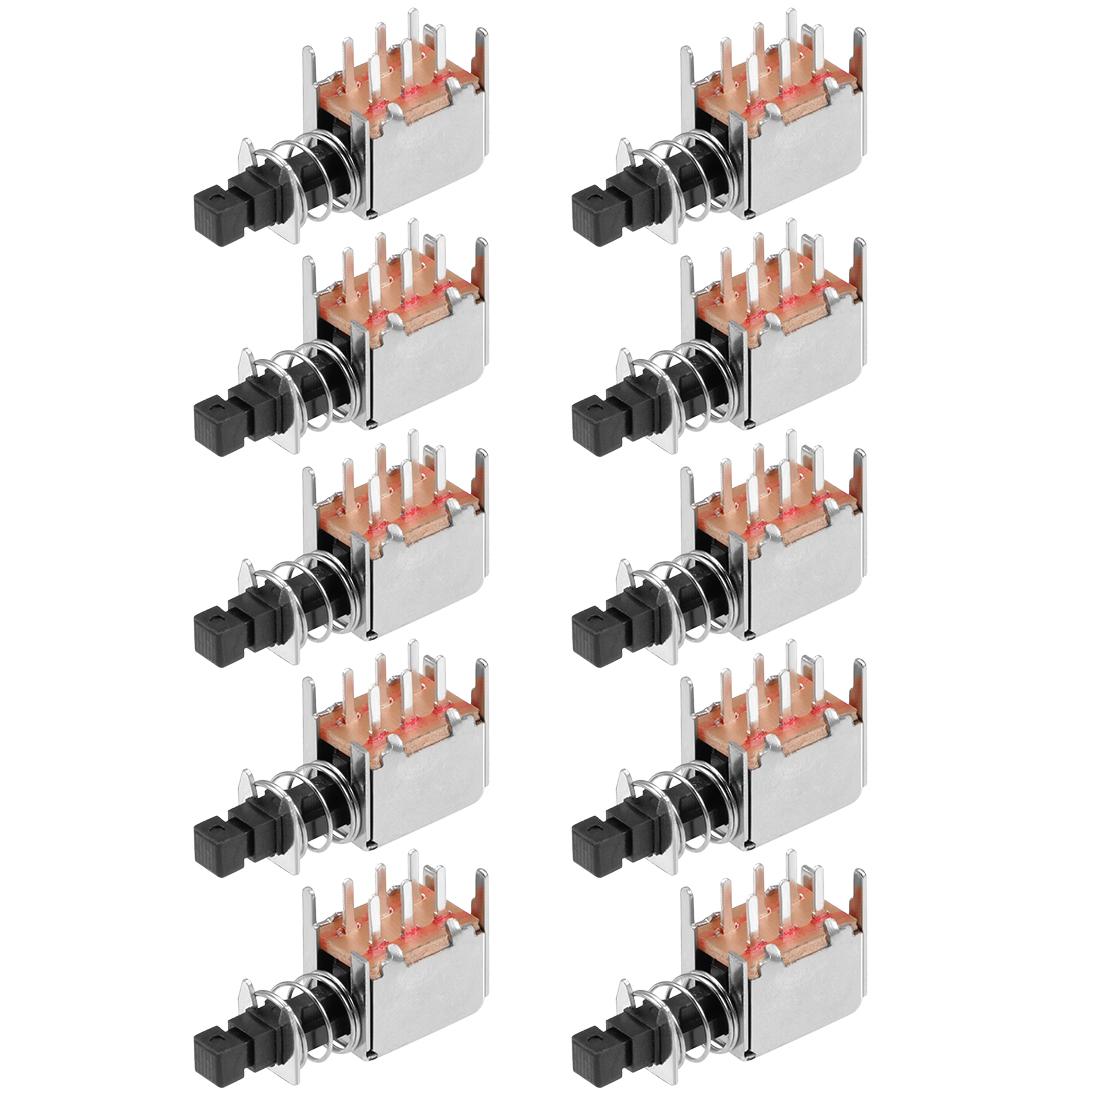 Push Button Switch DPDT 6 Pin 1 Position Self-Locking Black 10pcs